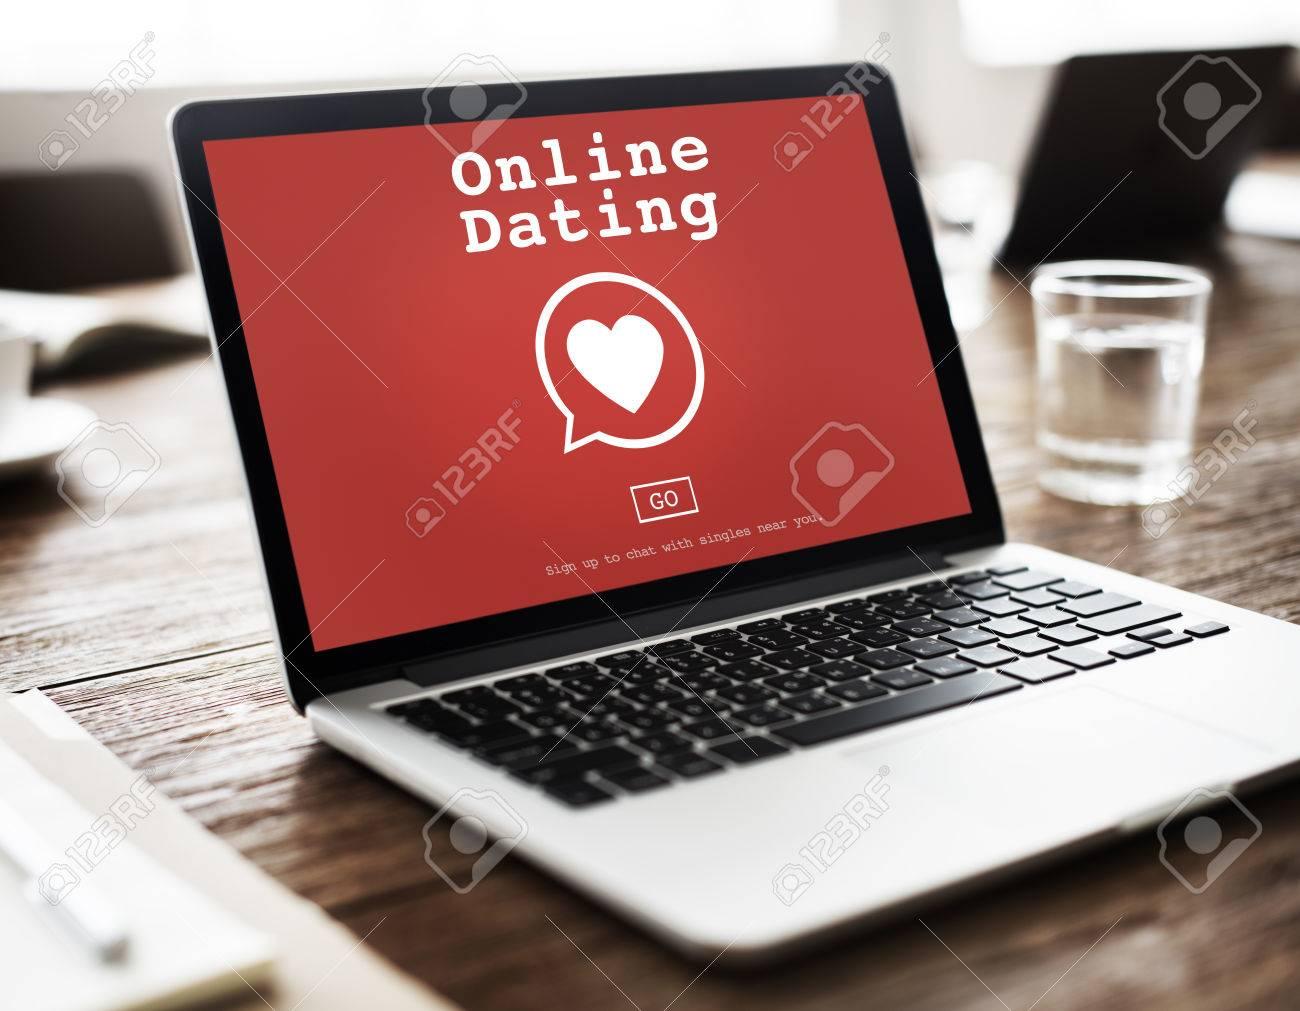 online chat matchmaking Liverpool dating webbplatser